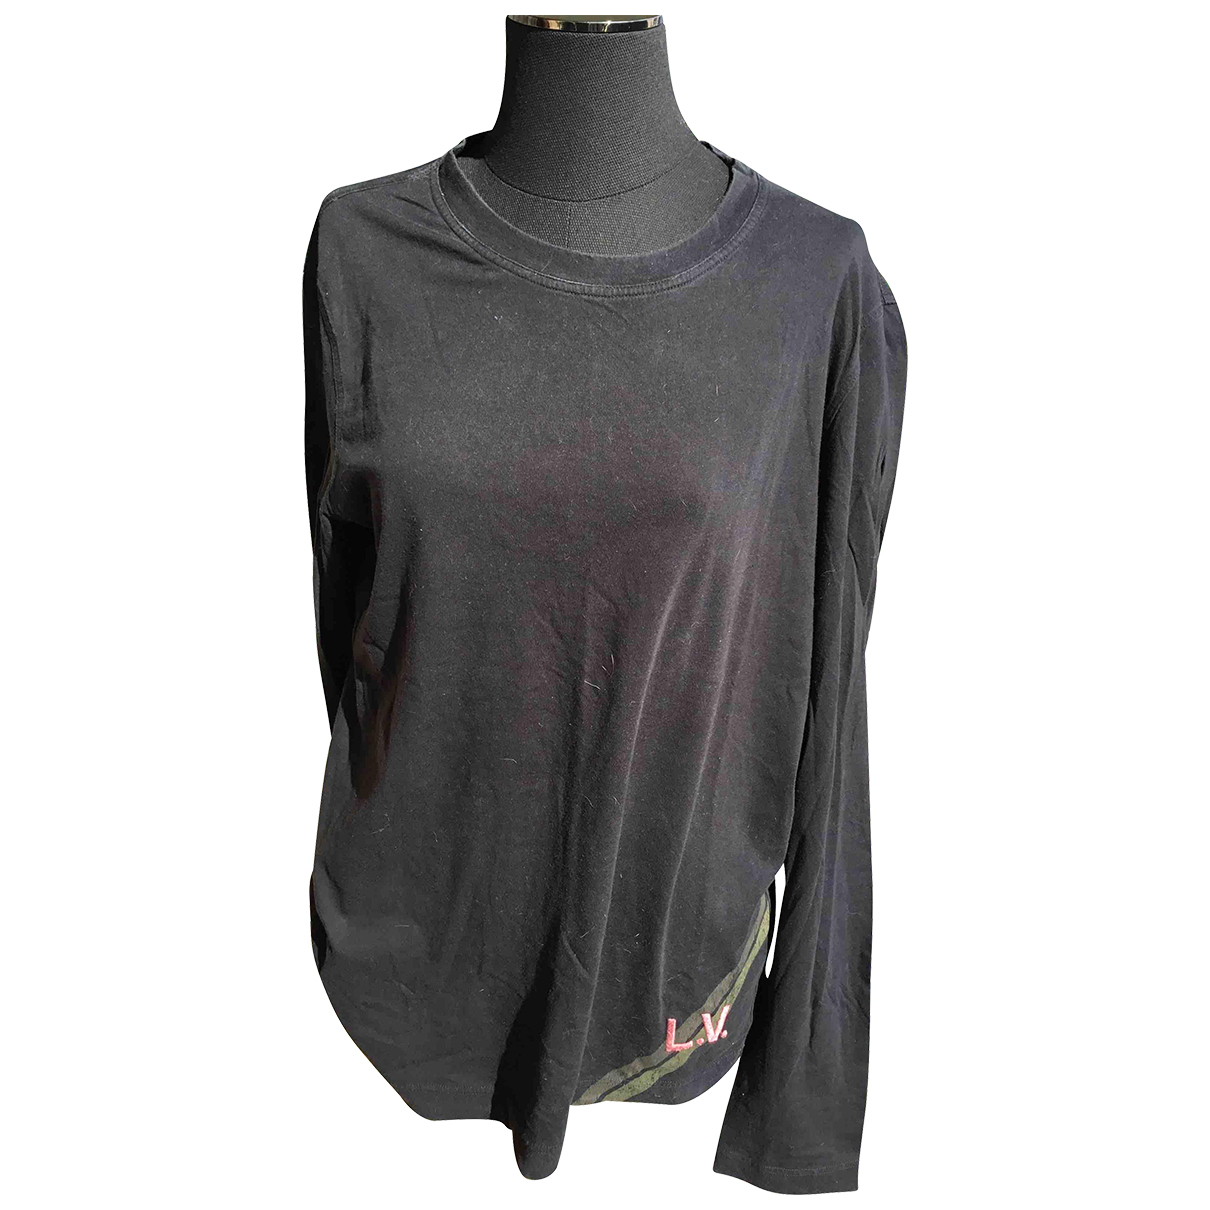 Camiseta Louis Vuitton